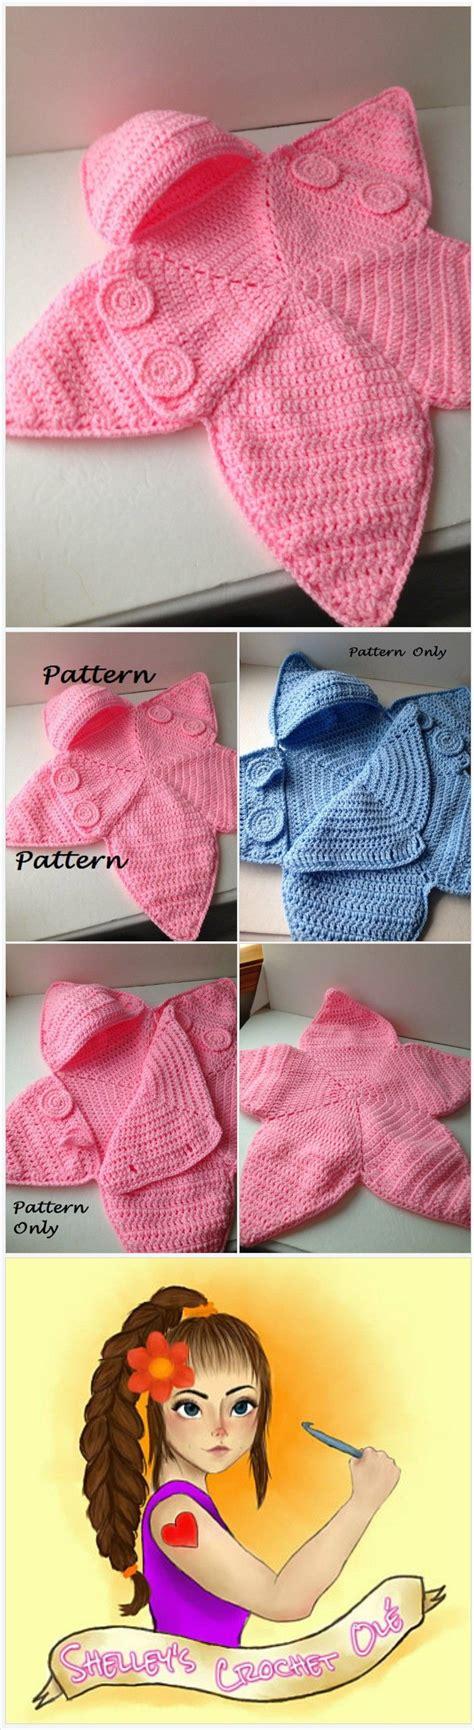 crochet pattern bunting bag pattern crochet baby star bunting pattern baby bag